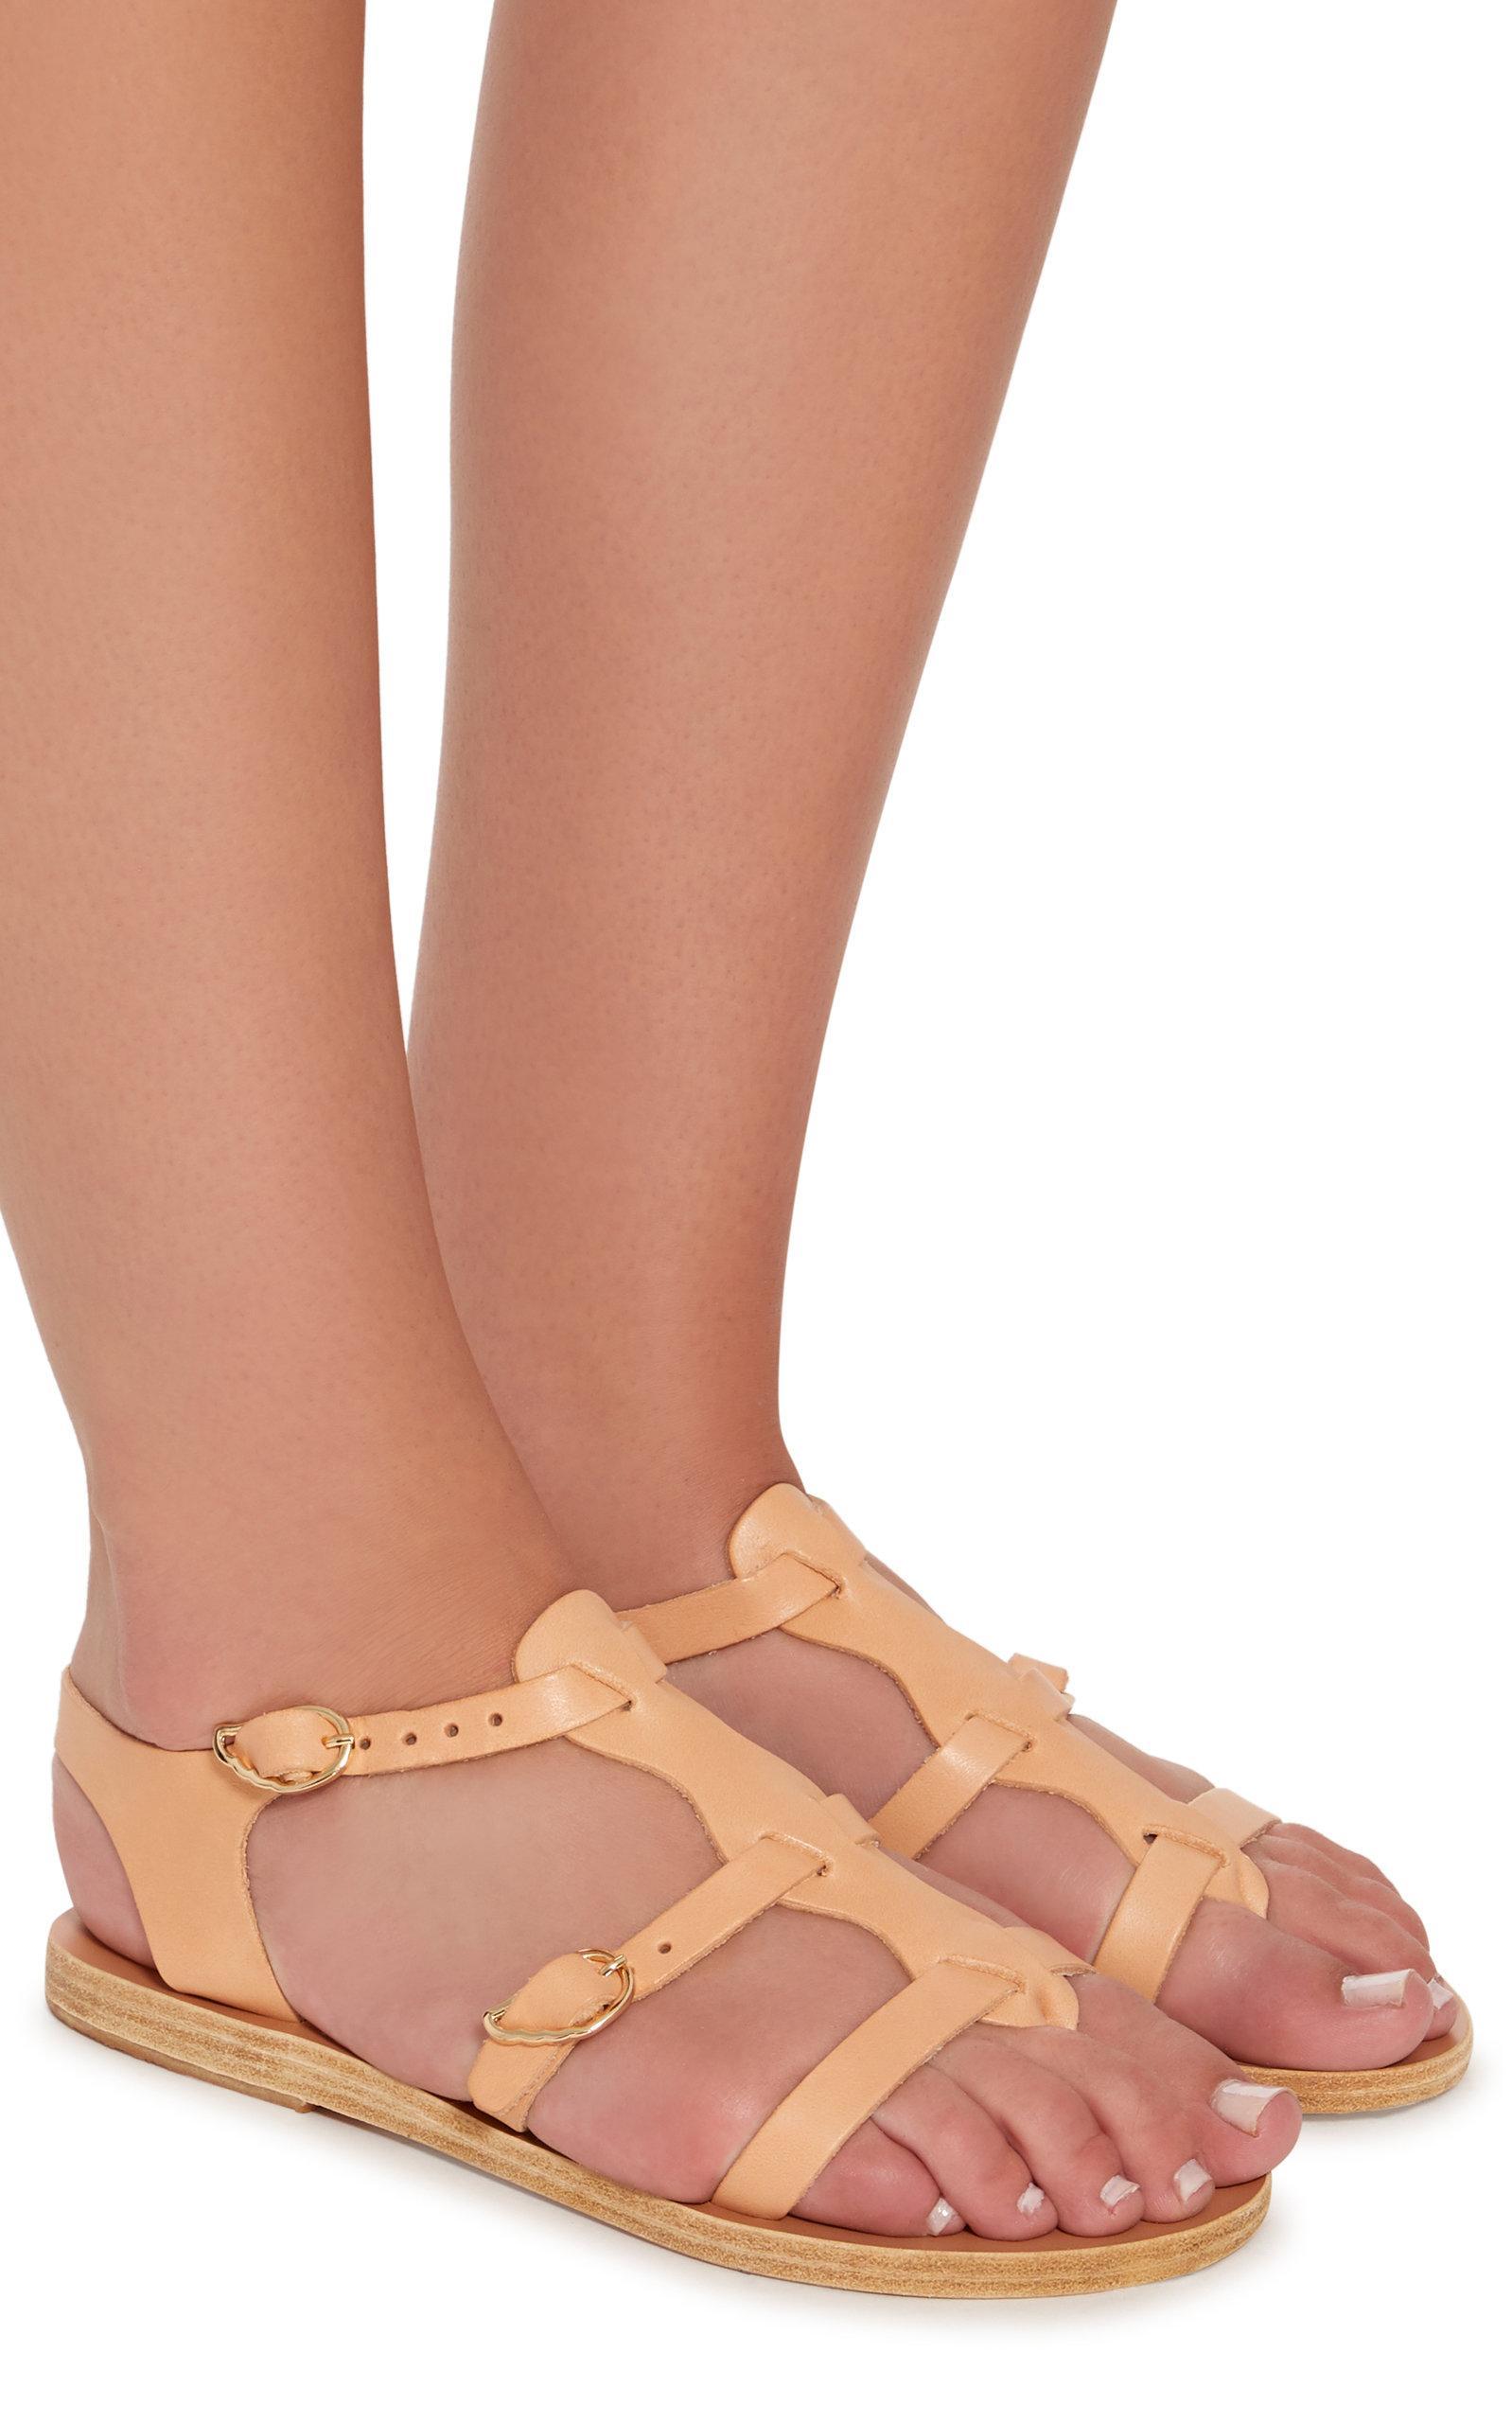 4f9c5200e Ancient Greek Sandals - Brown Grace Kelly Leather Sandals - Lyst. View  fullscreen